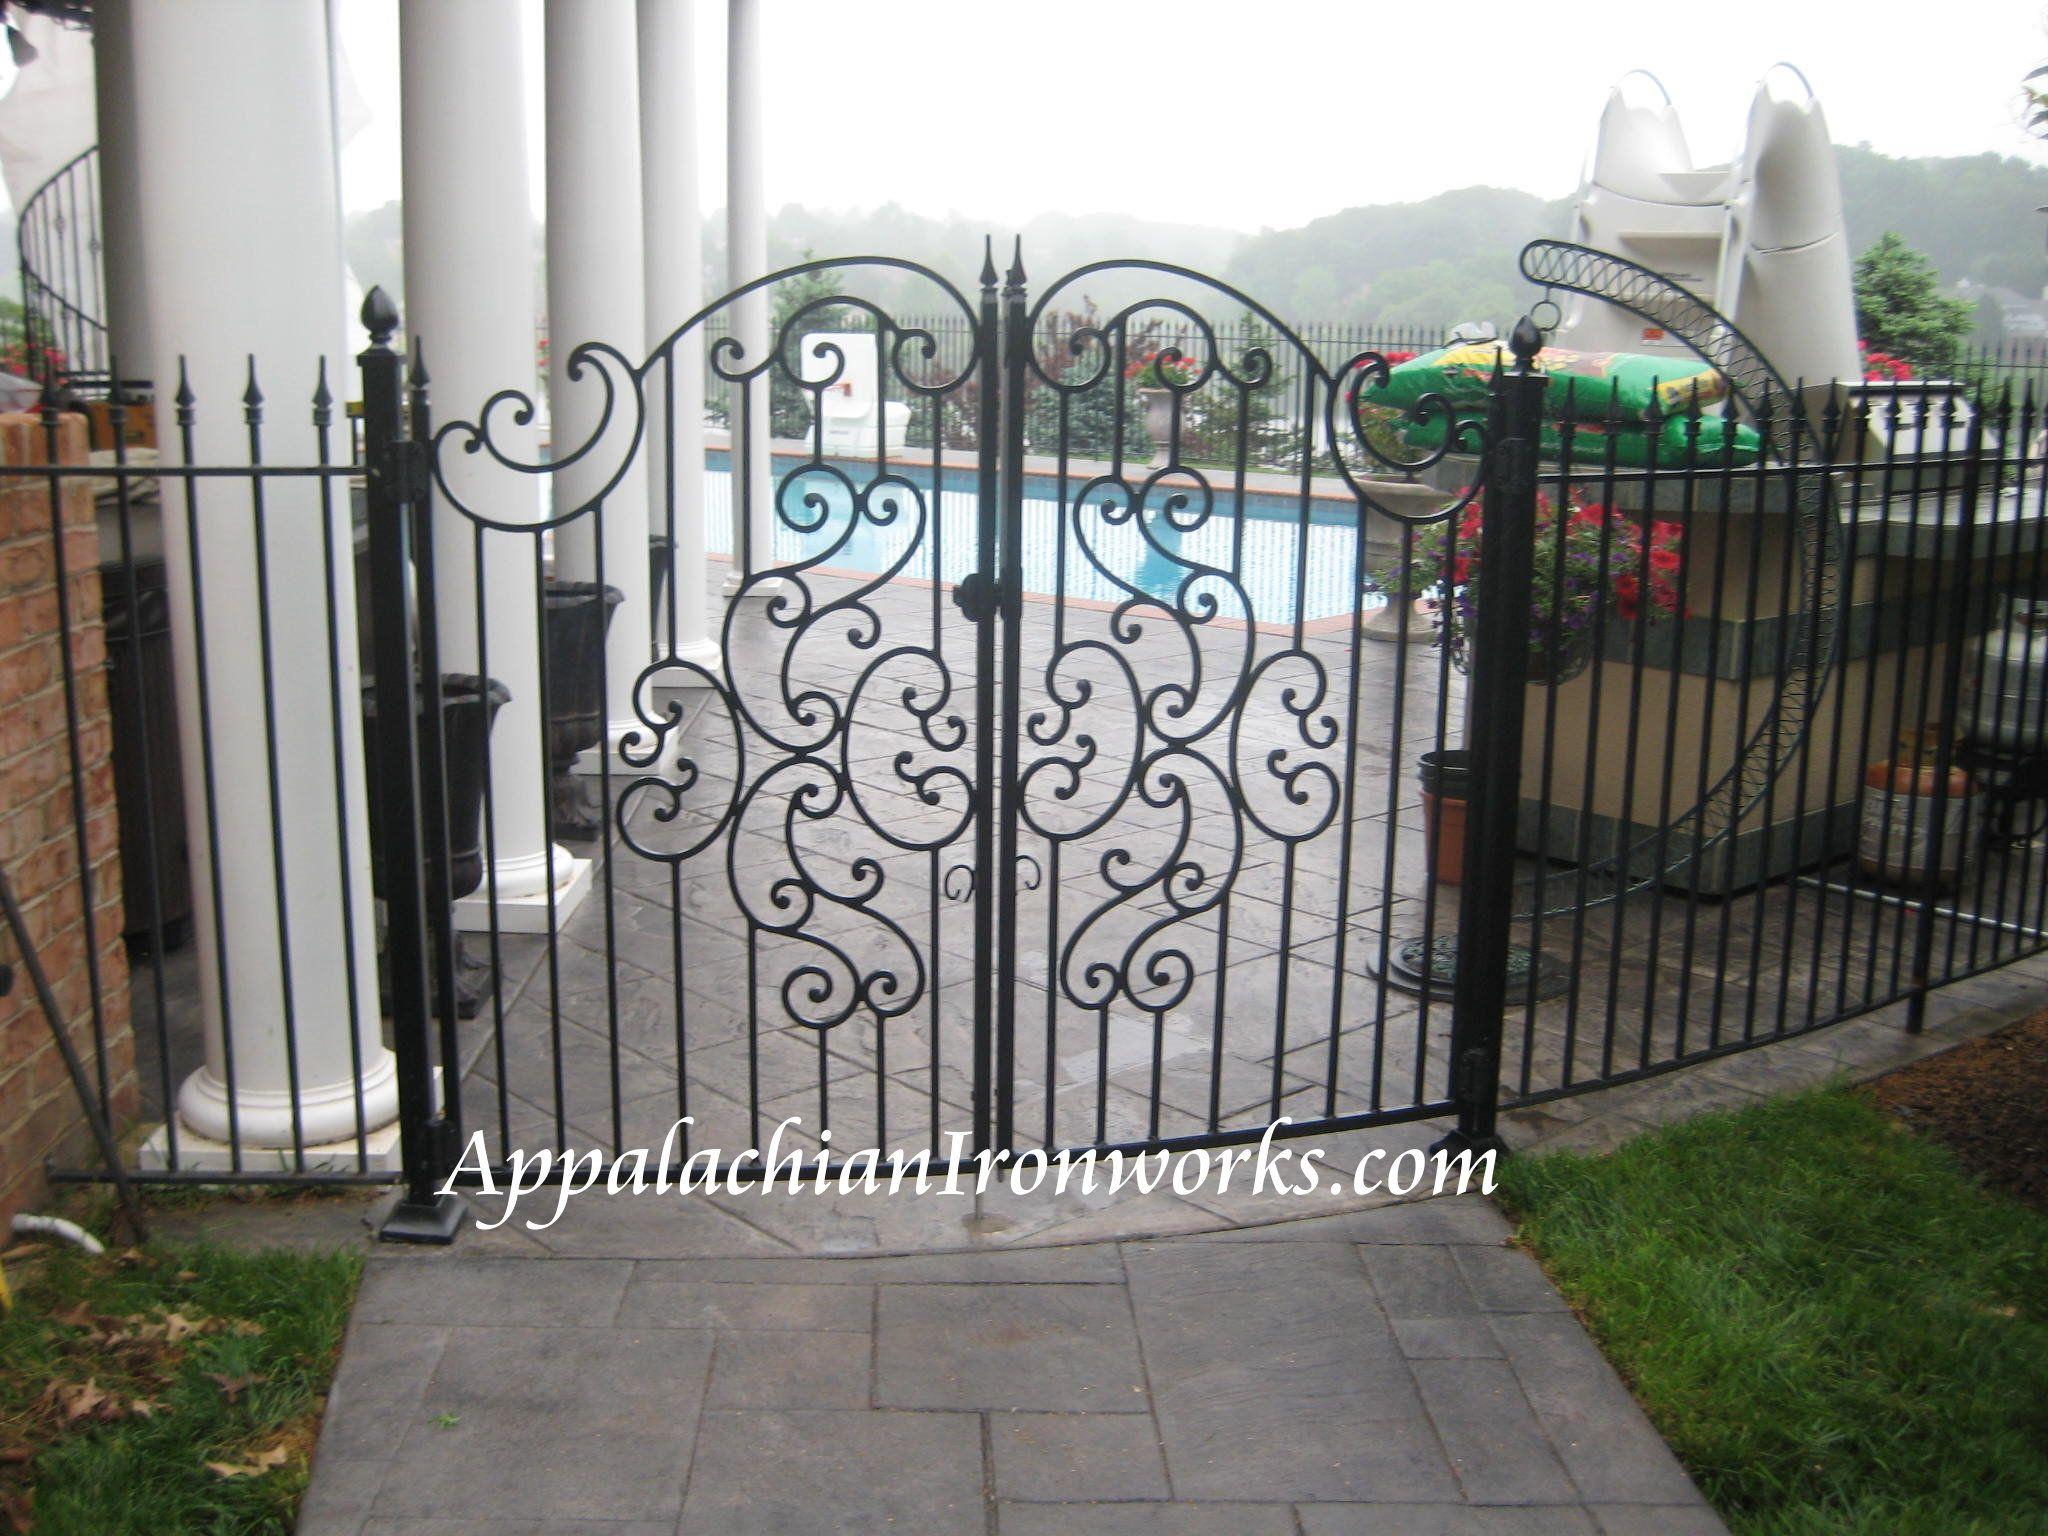 ironwork va decorative curved iron gate near pool with